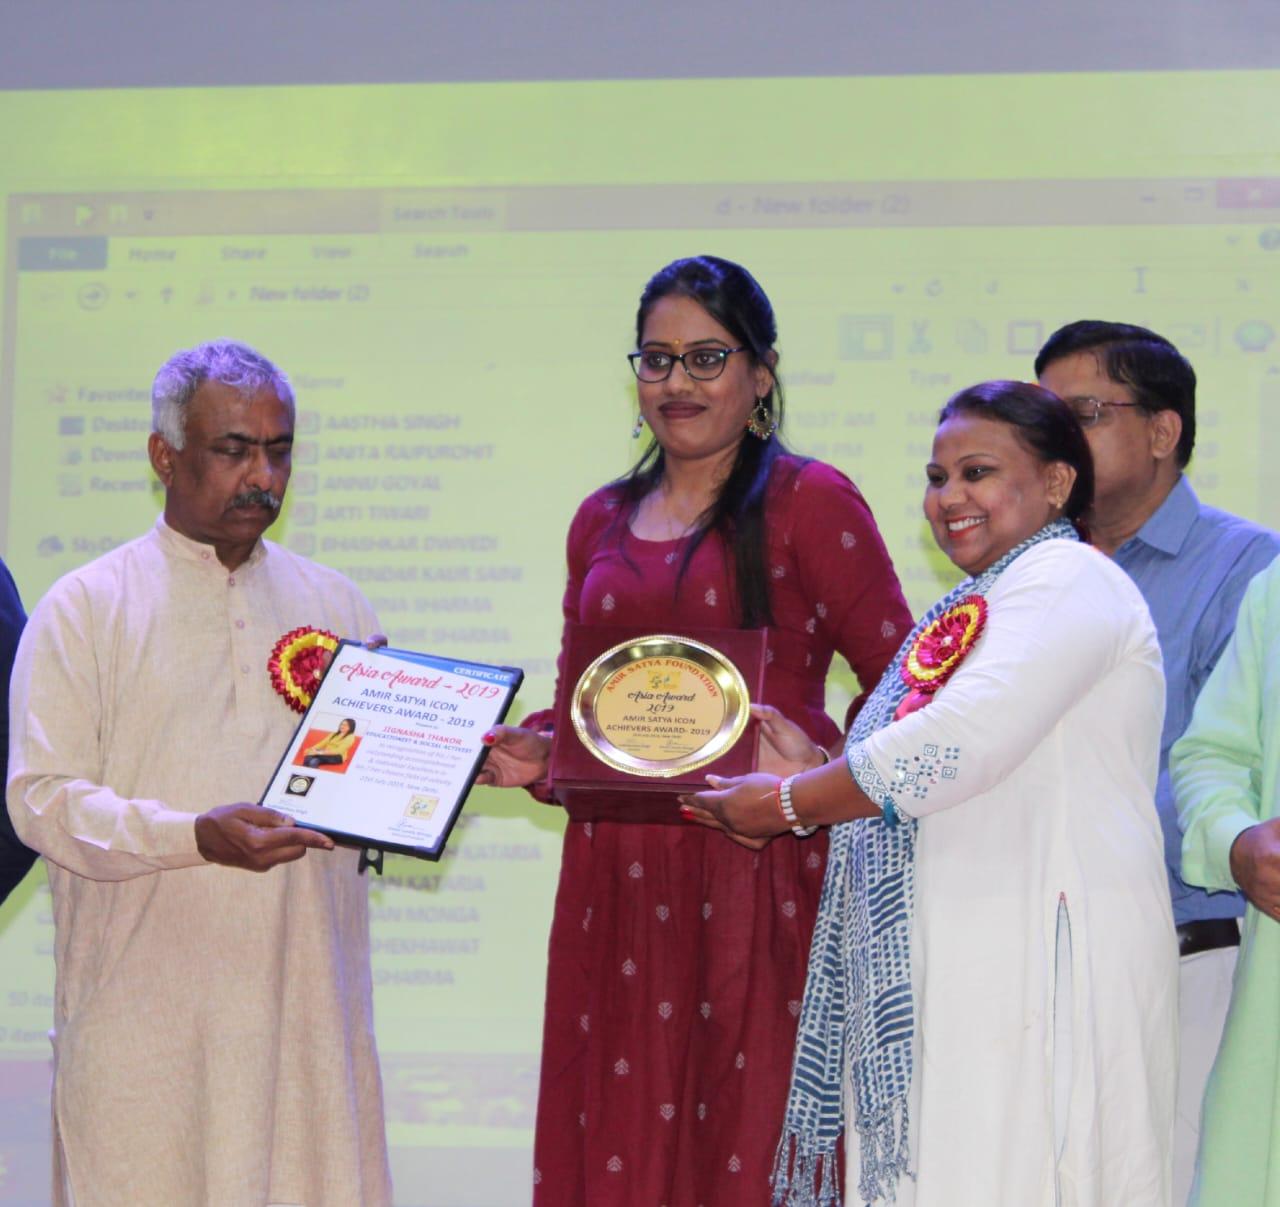 Meet social activist of Gujarat -jignasha thakor she recently got asia award for child education and women empowerment